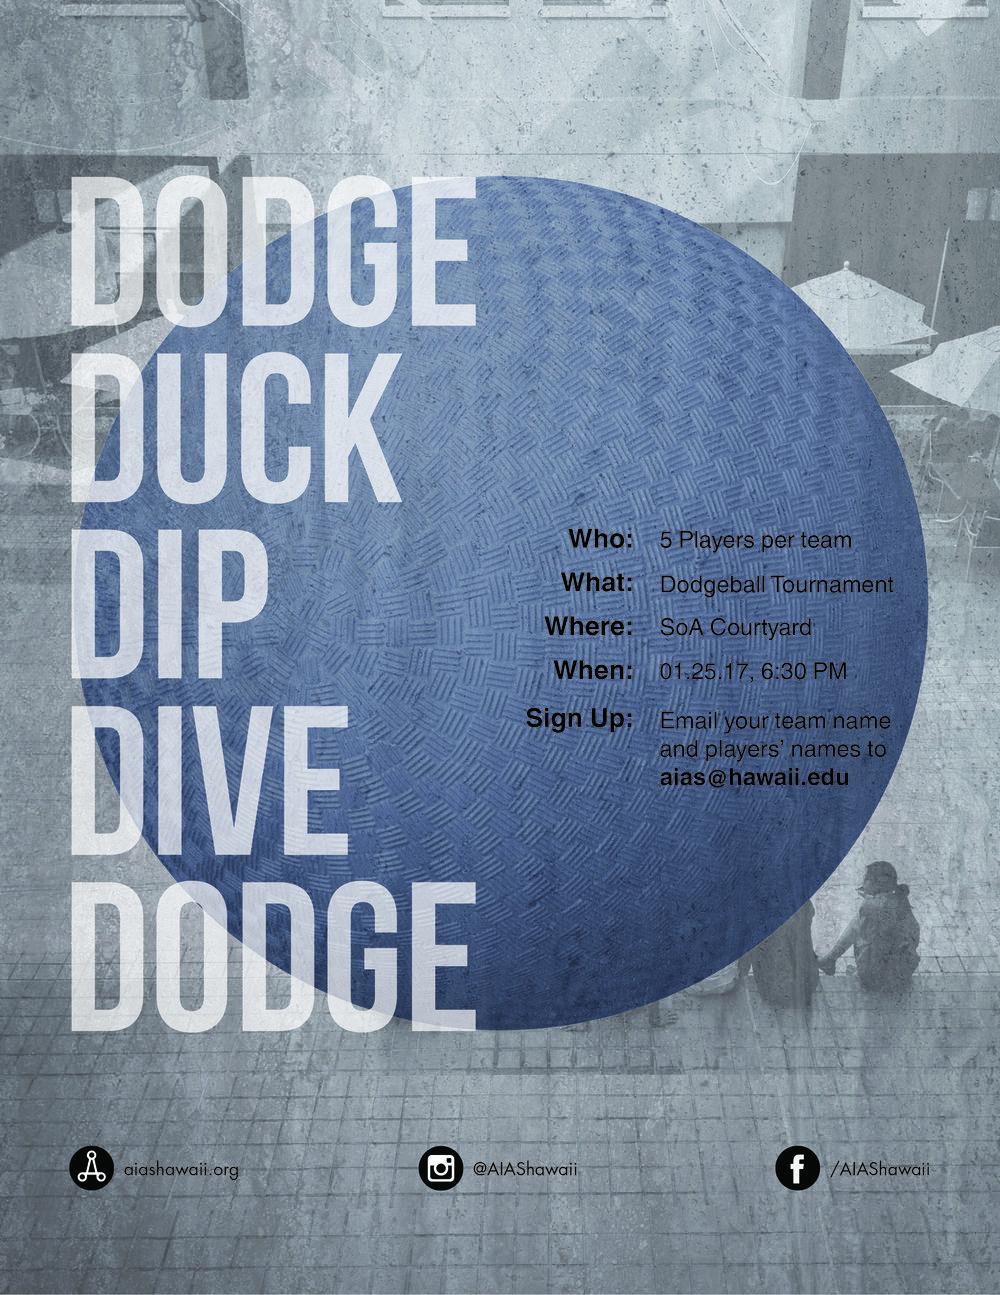 dodgeball_blue.jpg